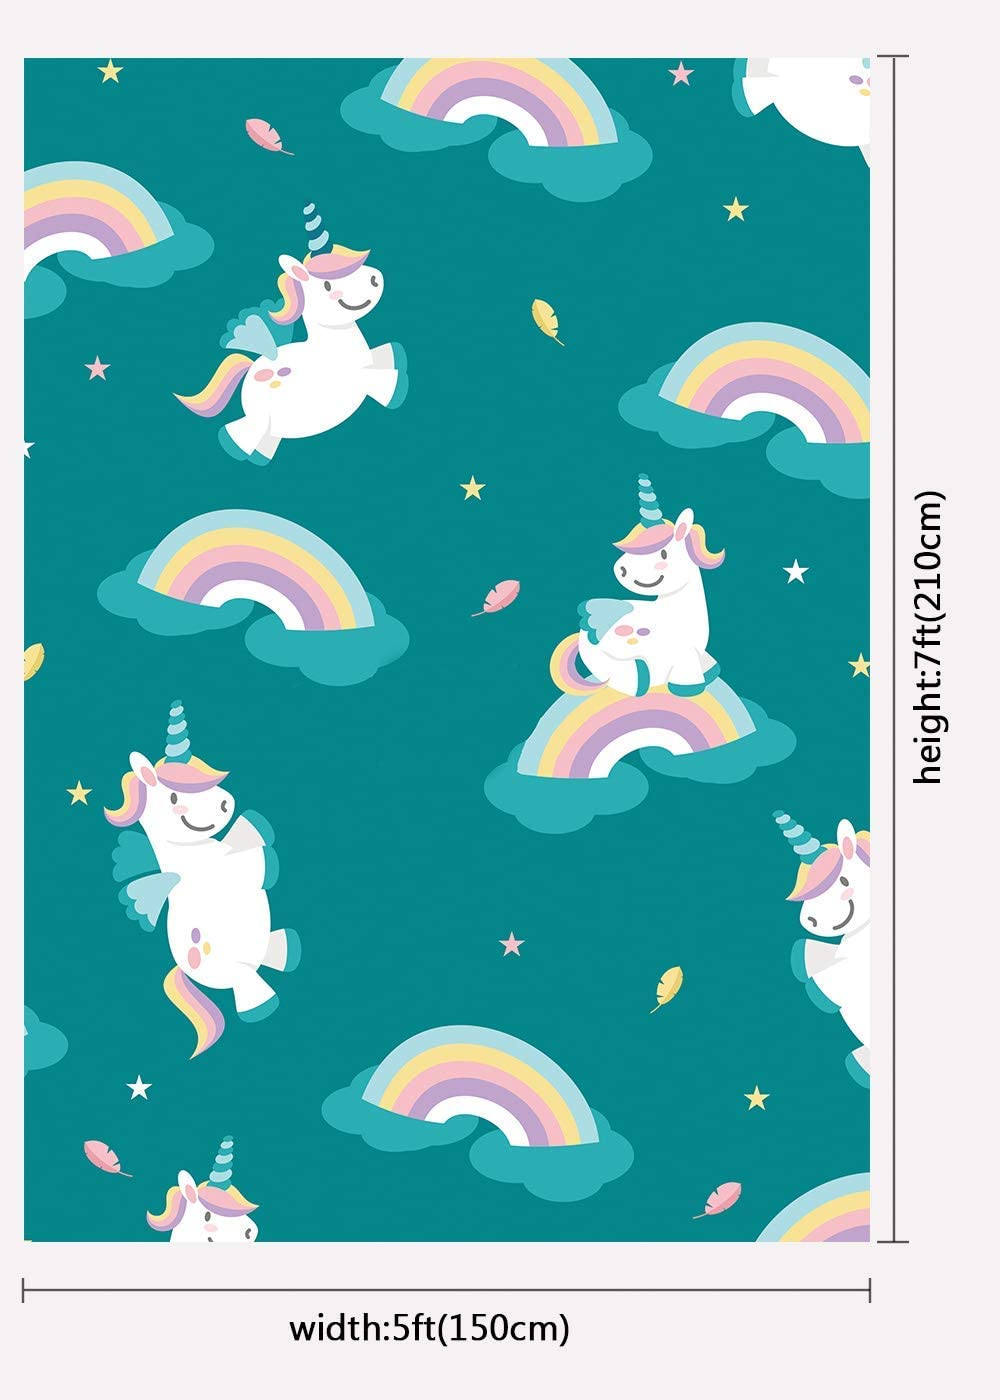 8x10ft Background Rainbow Unicorn Photography Backdrop Photo Studio Props LHFU066